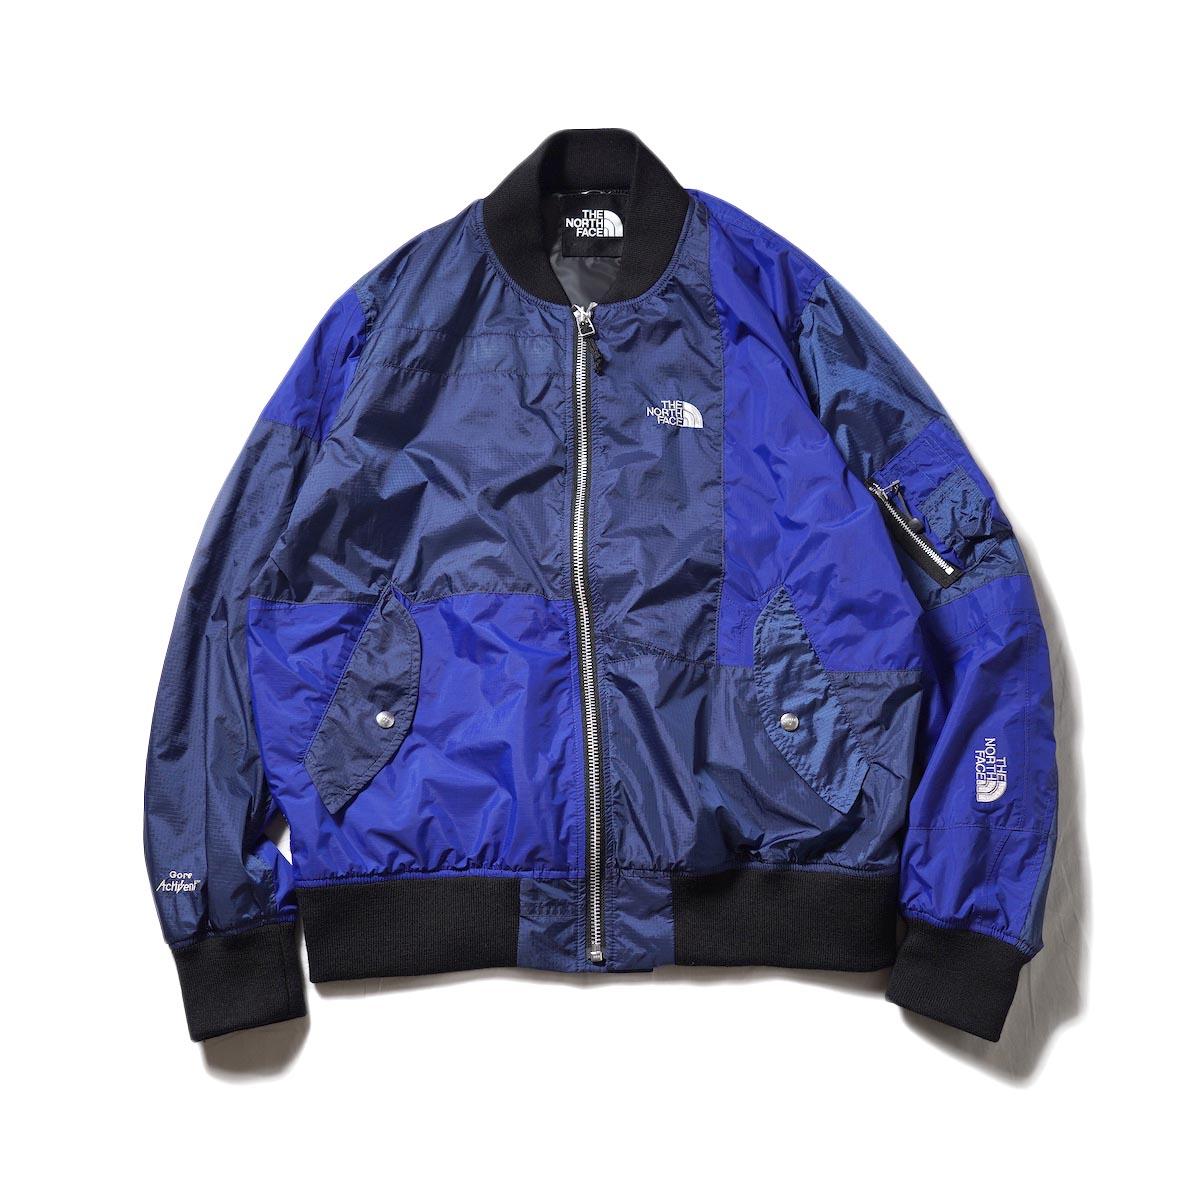 OLD PARK / Flight Jacket Outdoor (XXLsize)